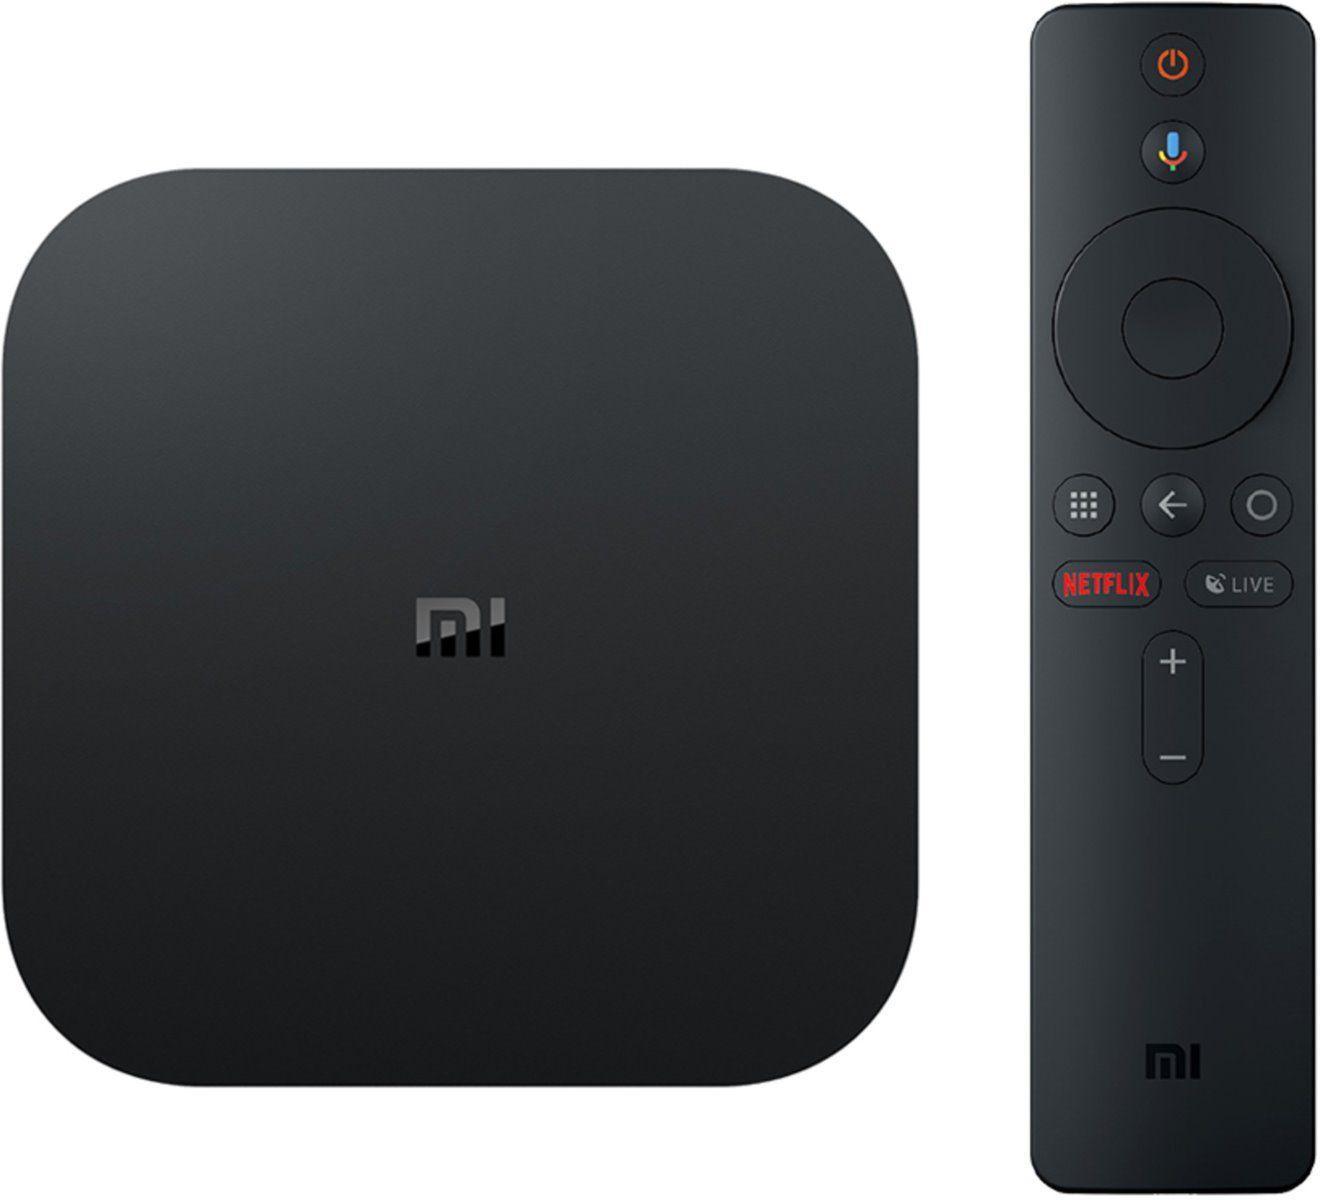 TV SMART плейър Xiaomi Mi TV Box S EU PFJ4086EU, 2GB DDR3, Andoid, Quad-core Cortex-A53 2.0GHz, Черен-2